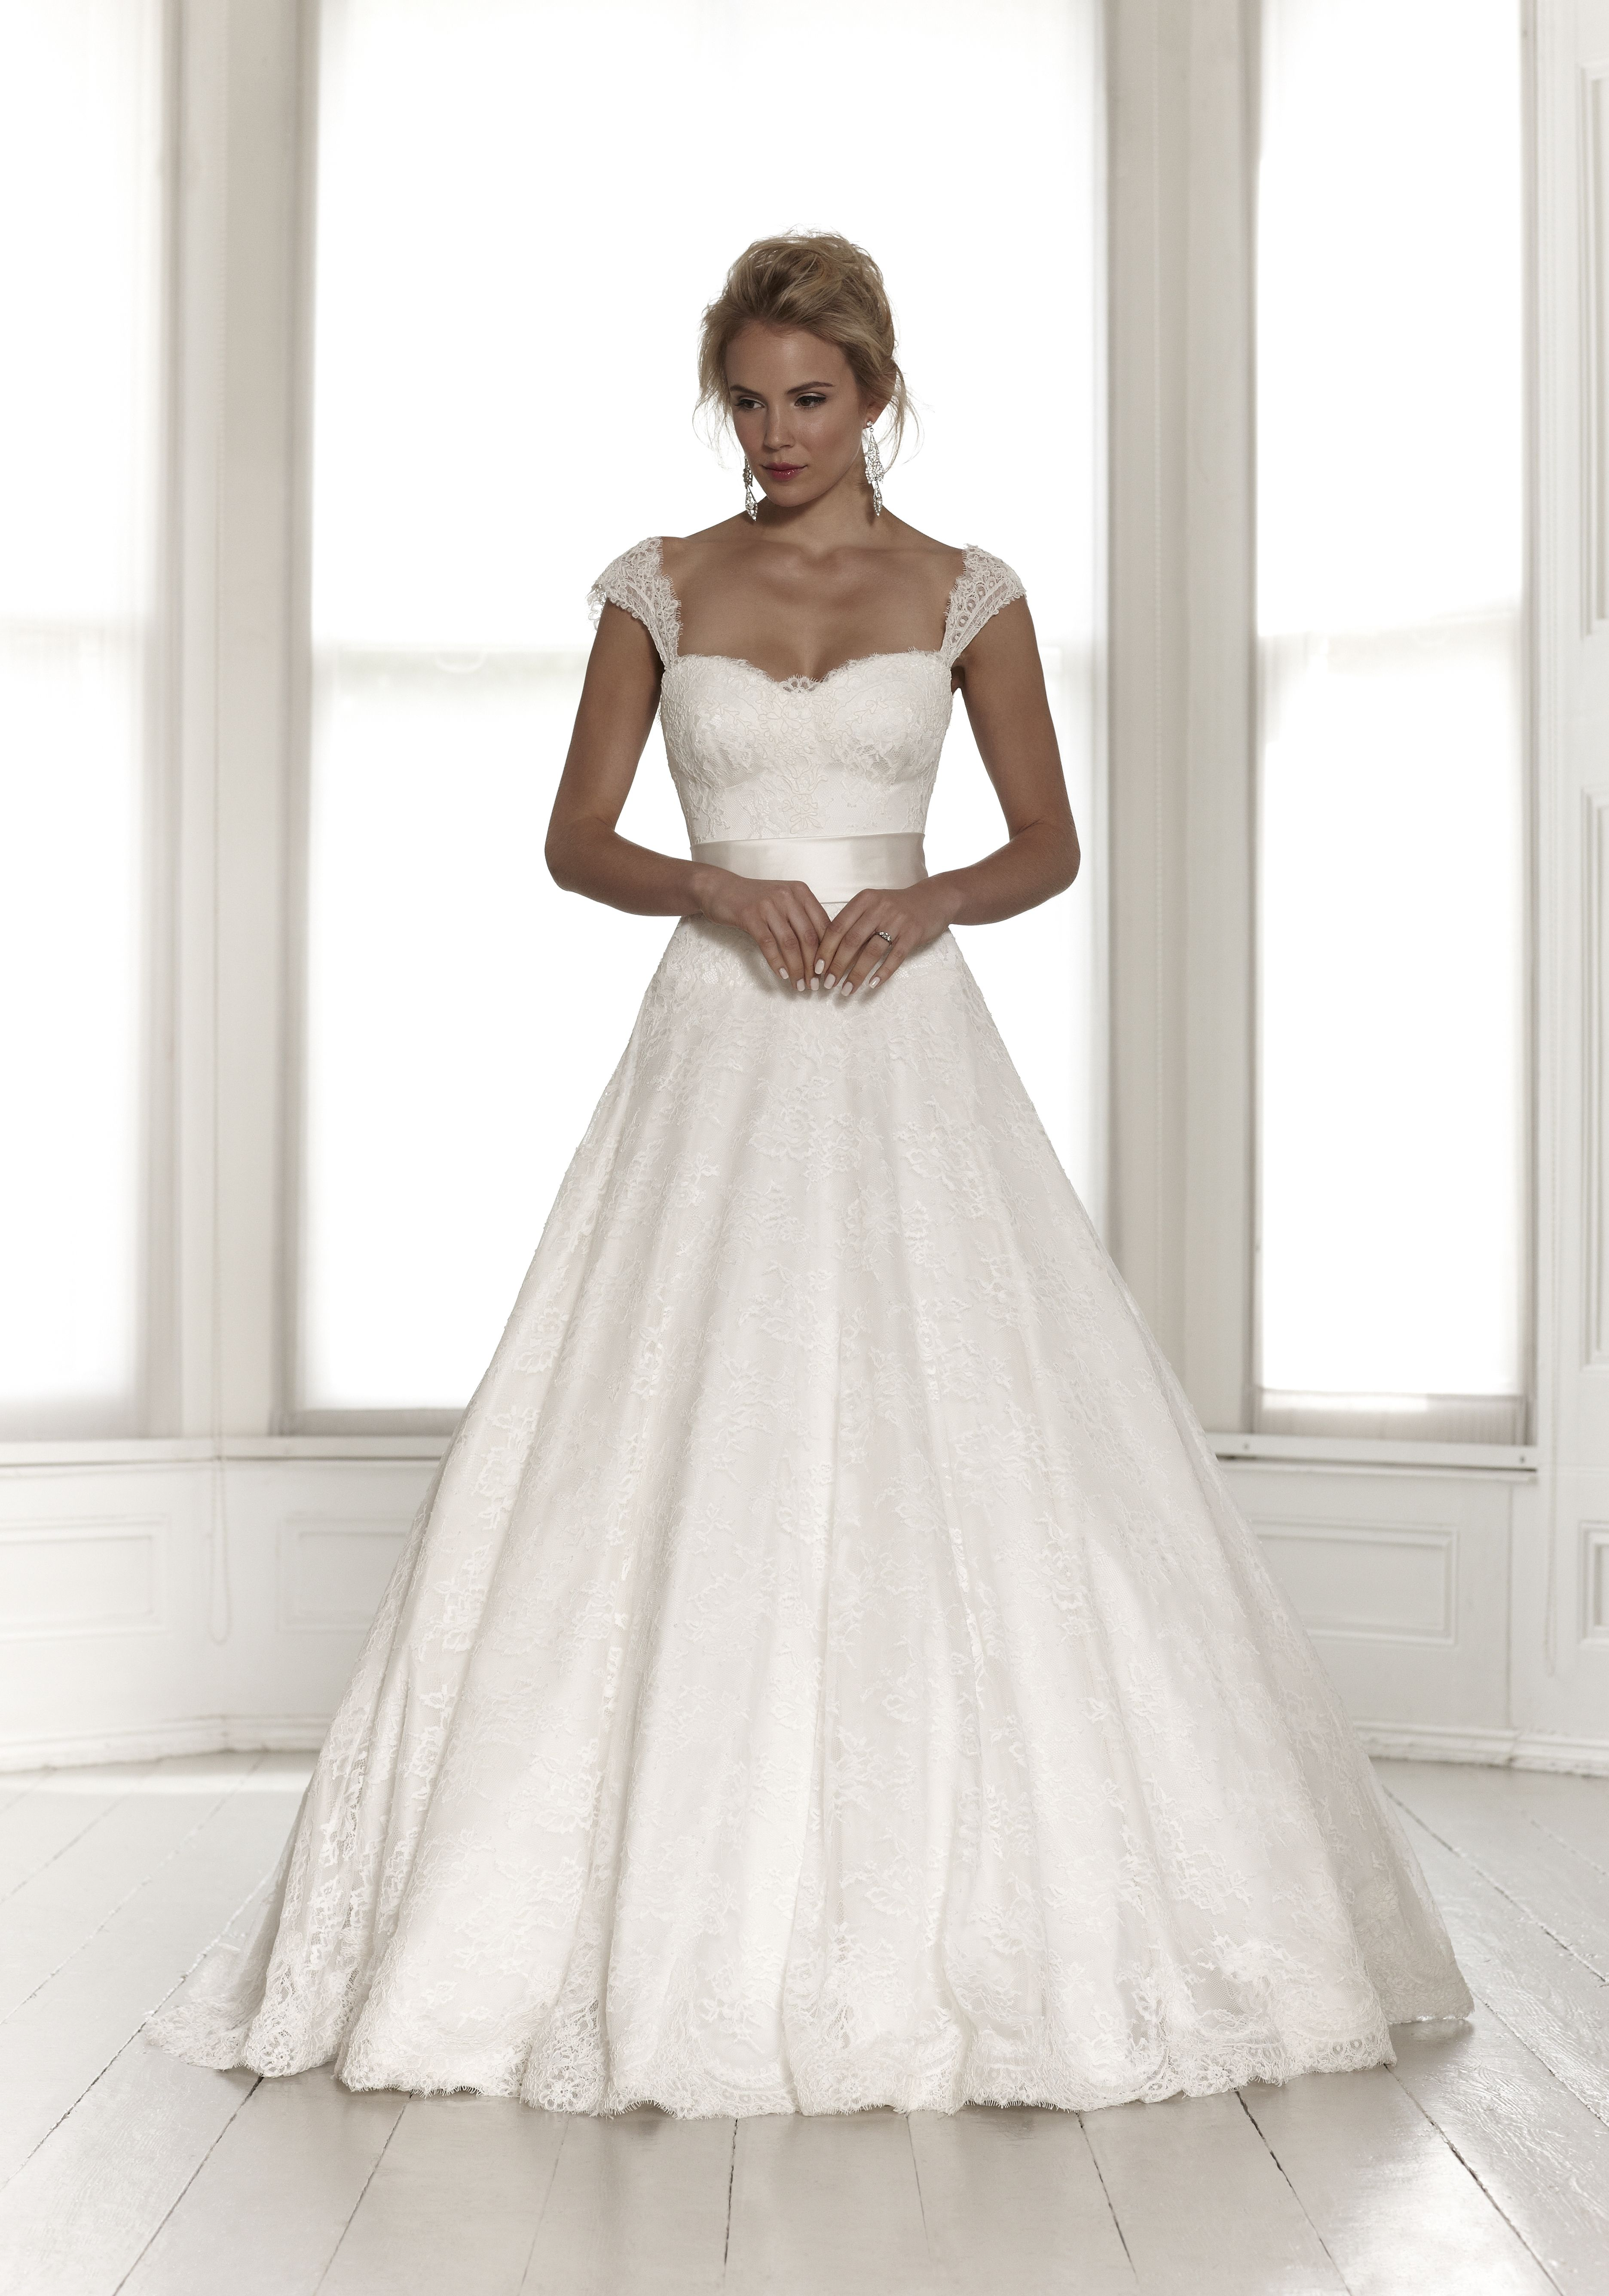 Lace wedding dress designers  Designers  Sassi Holford  Atelier Bride  Hochzeit  Pinterest